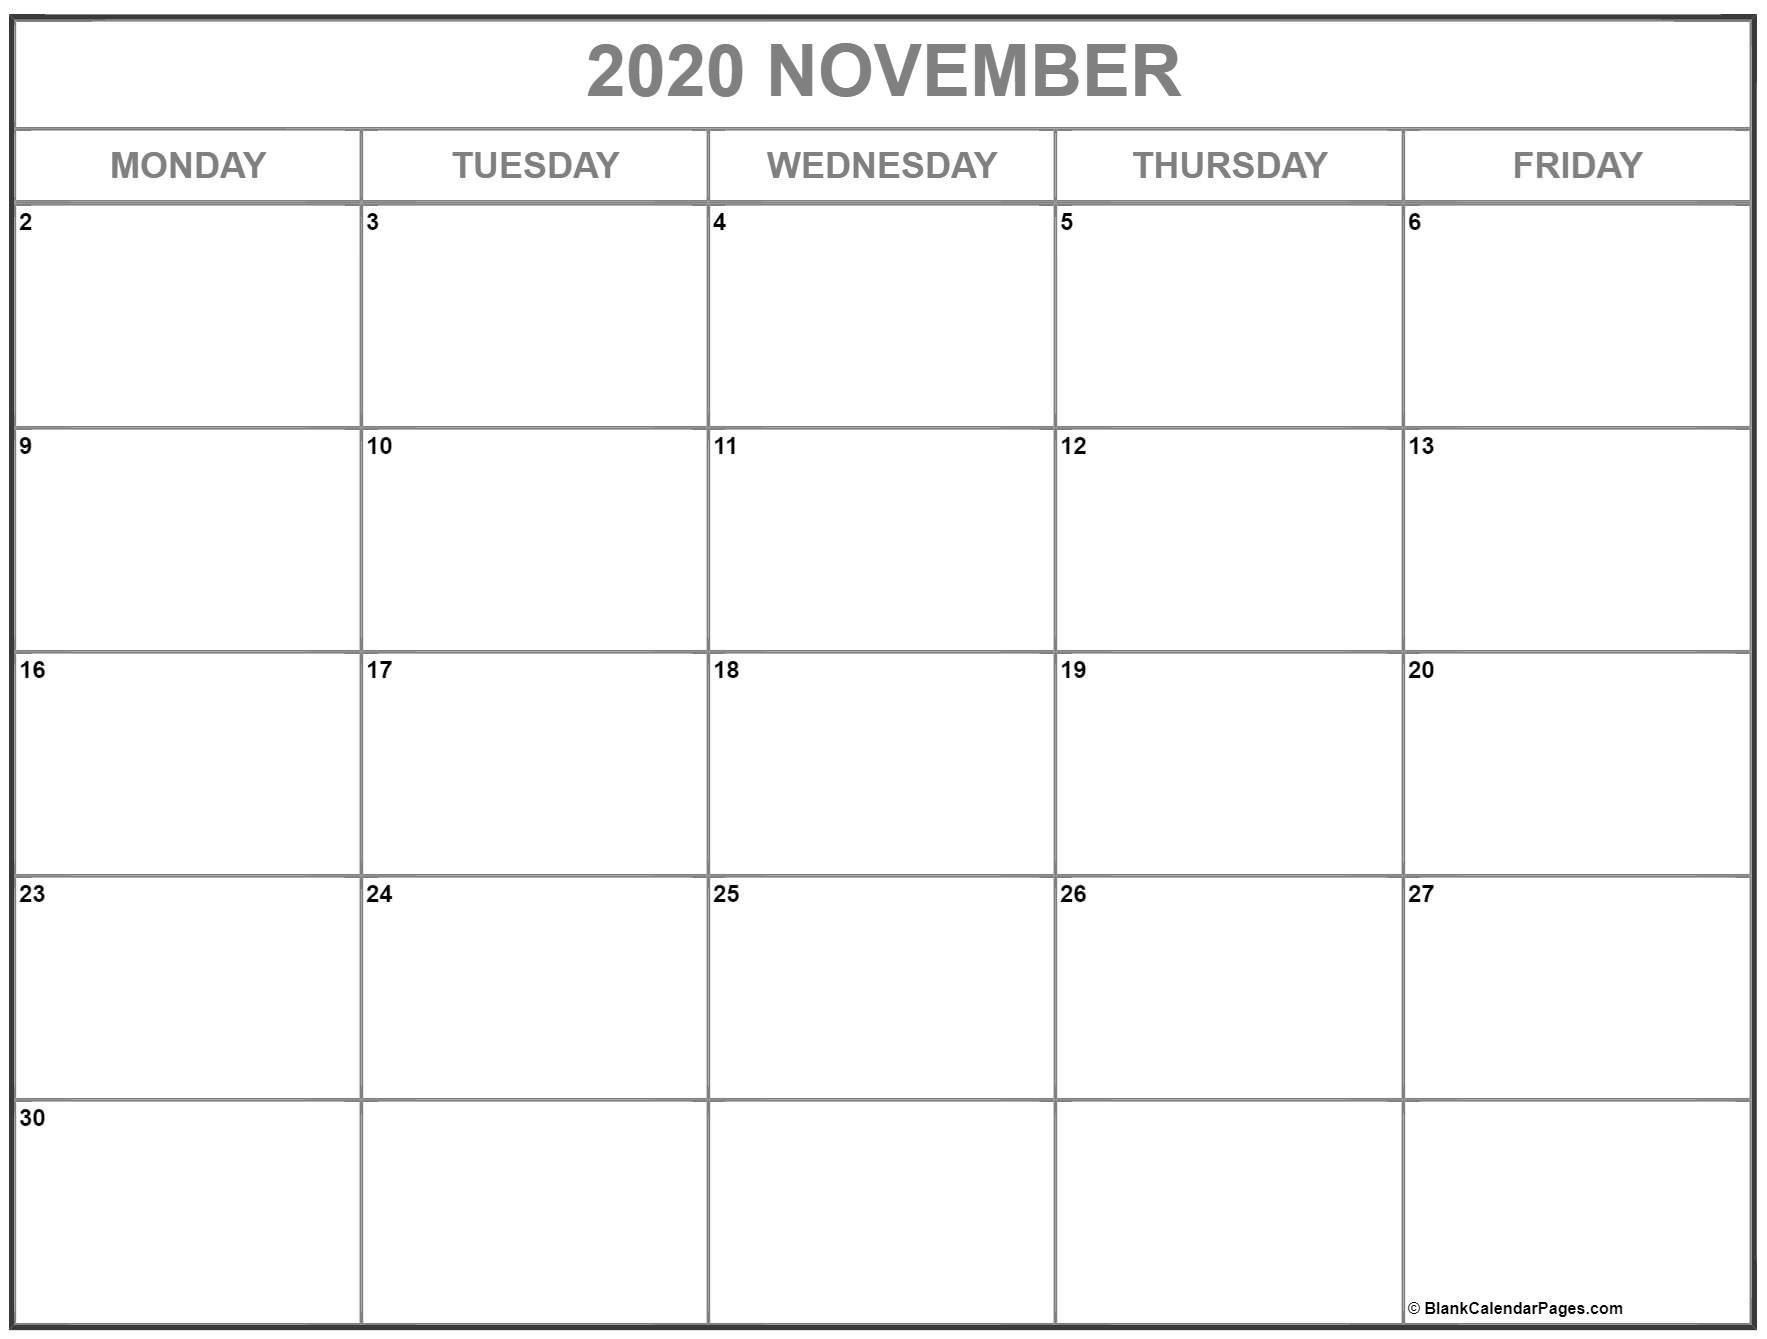 November 2020 Monday Calendar | Monday To Sunday Monday To Friday Calender